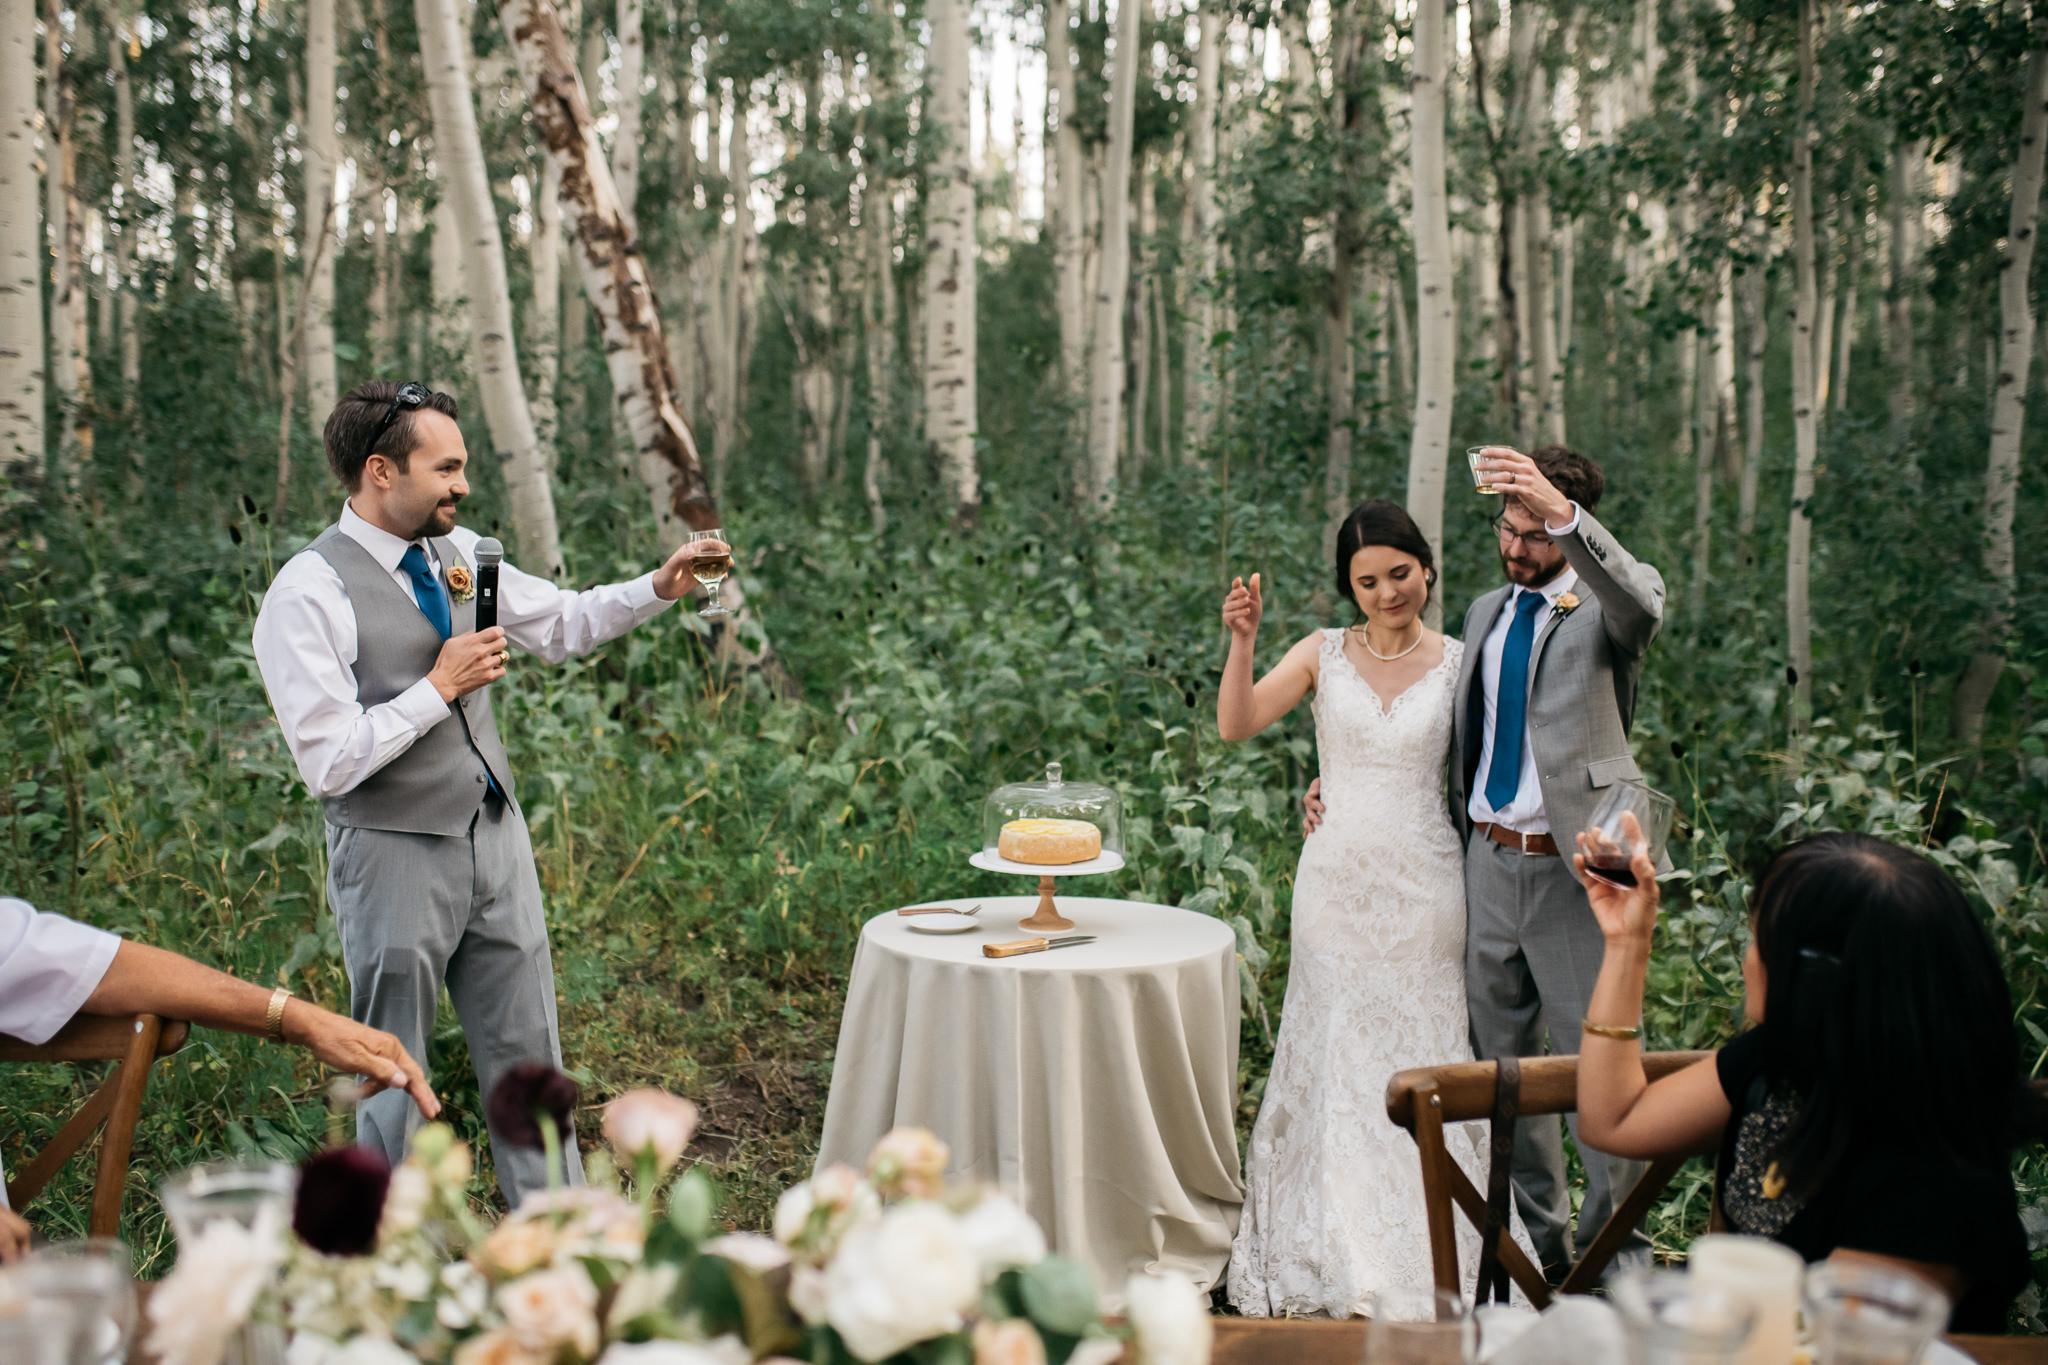 564_ONL_Kat_Nick_Wedding_Trevor_Hooper_Photo.jpg